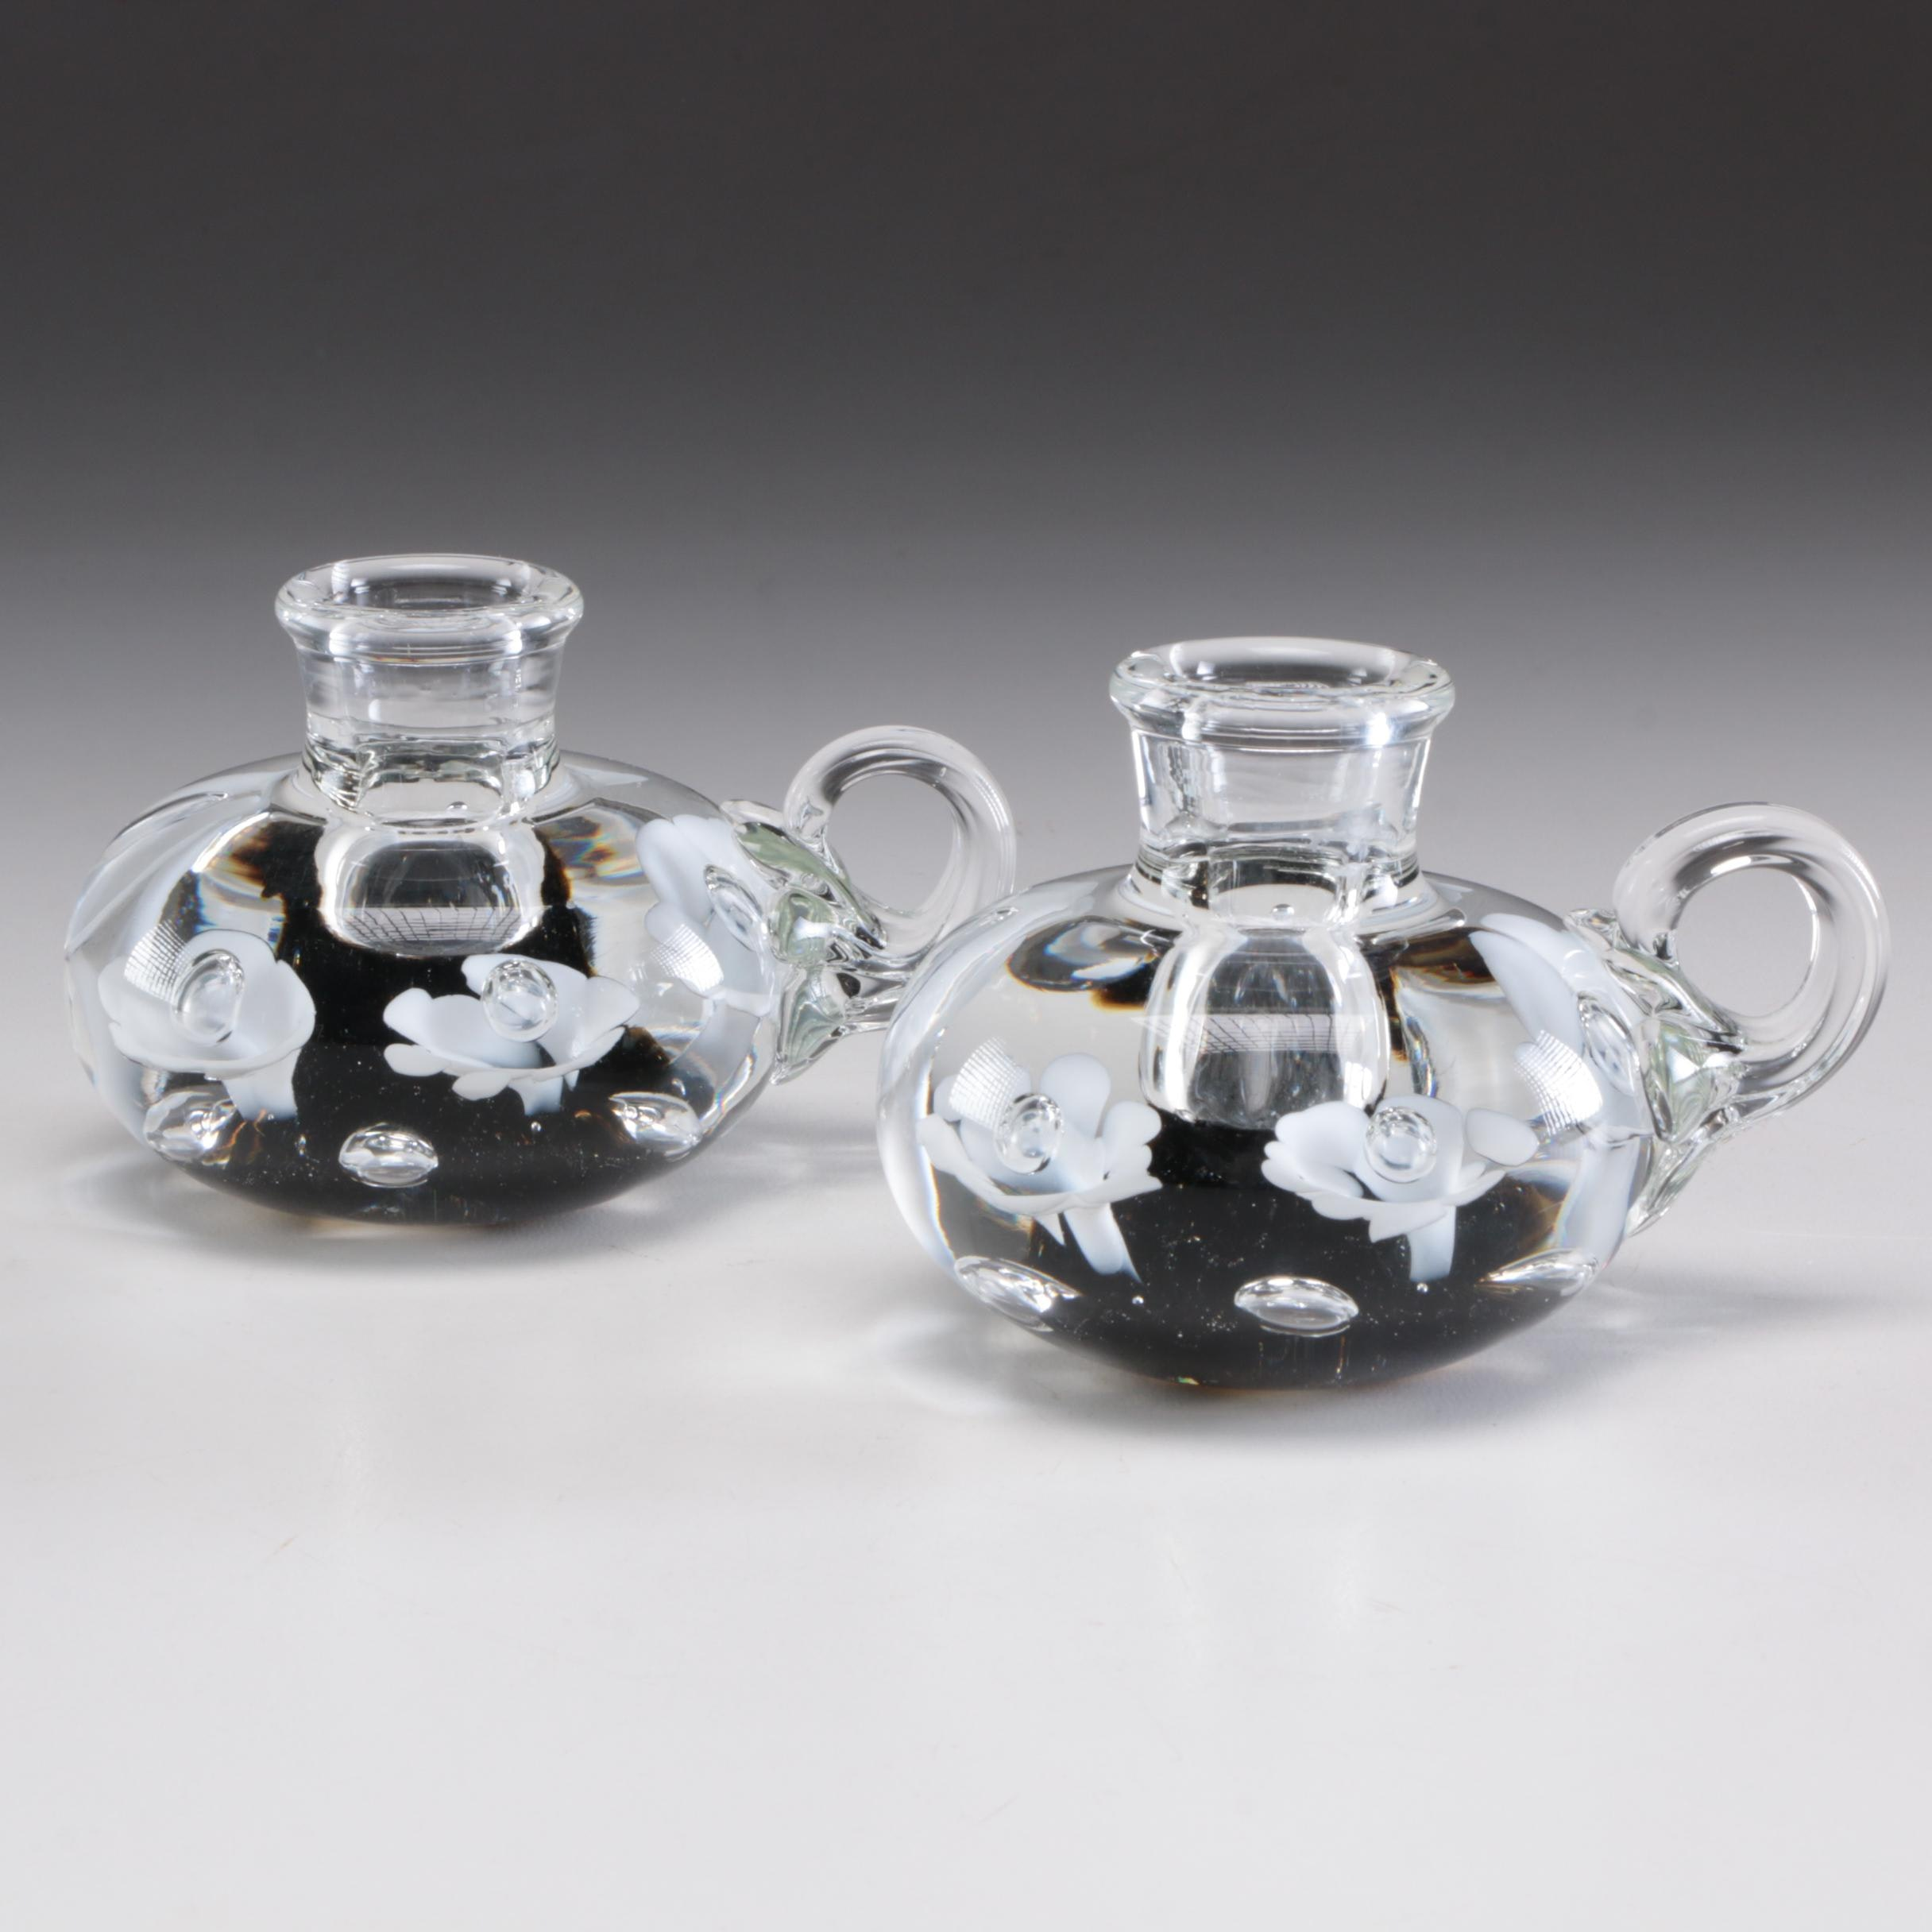 Joe Rice St. Clair Art Glass Candle Holders